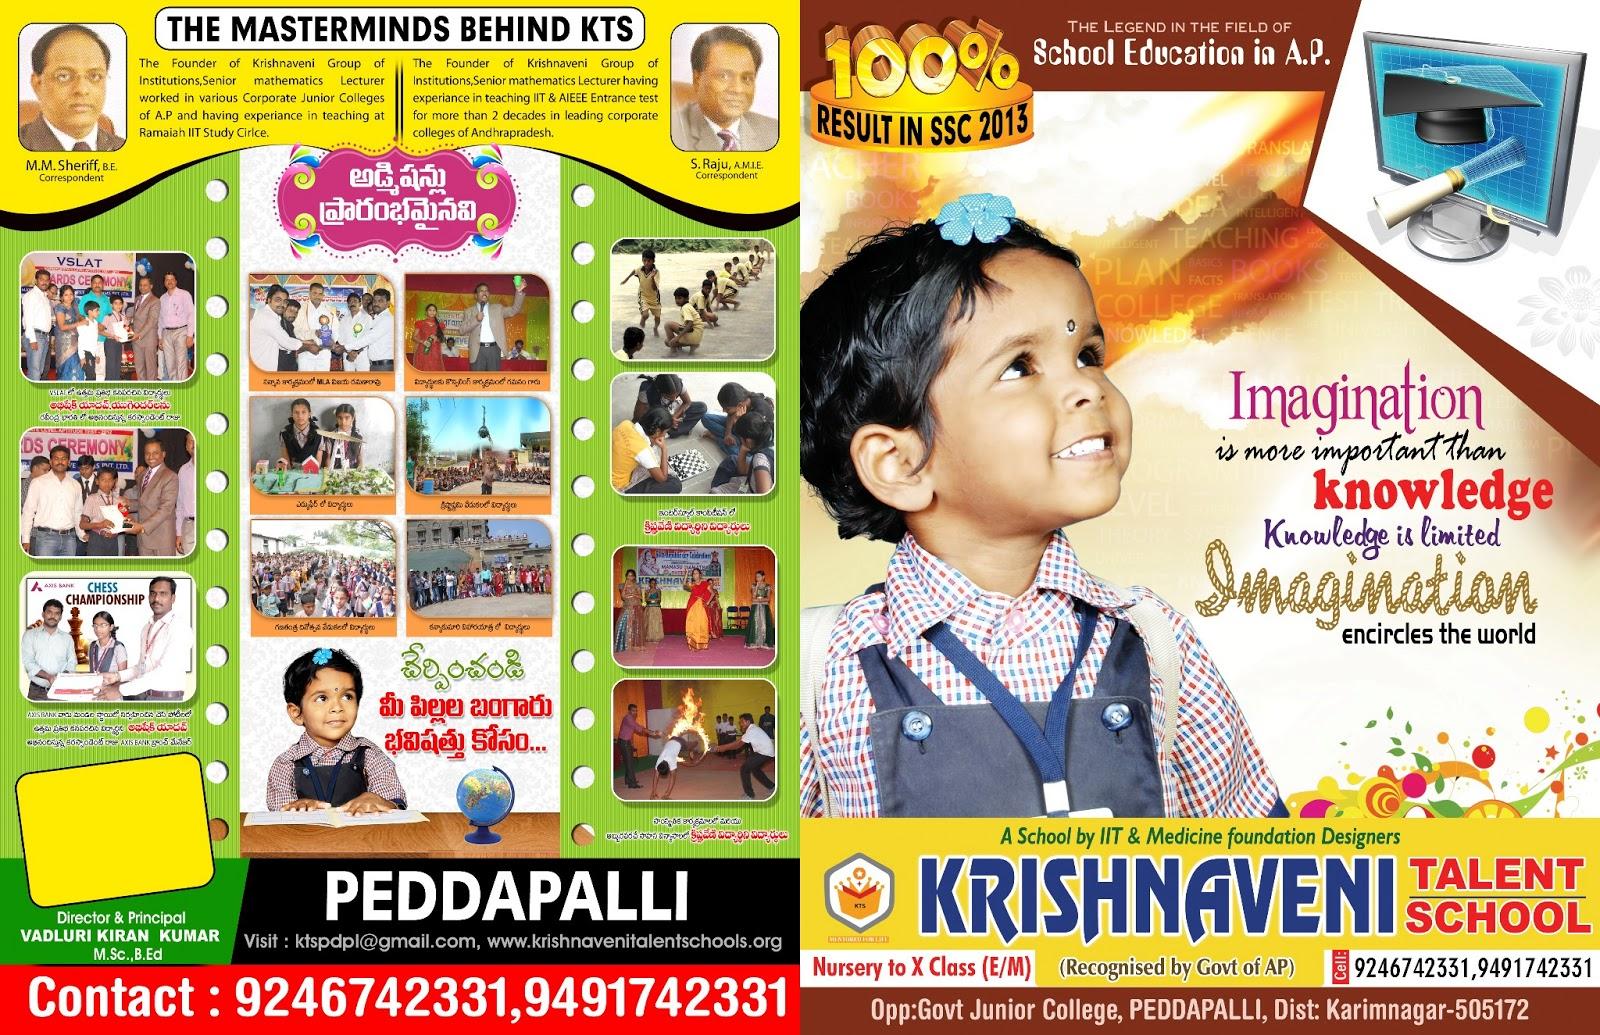 Krishnaveni Talent School Custom Brochure Design Template